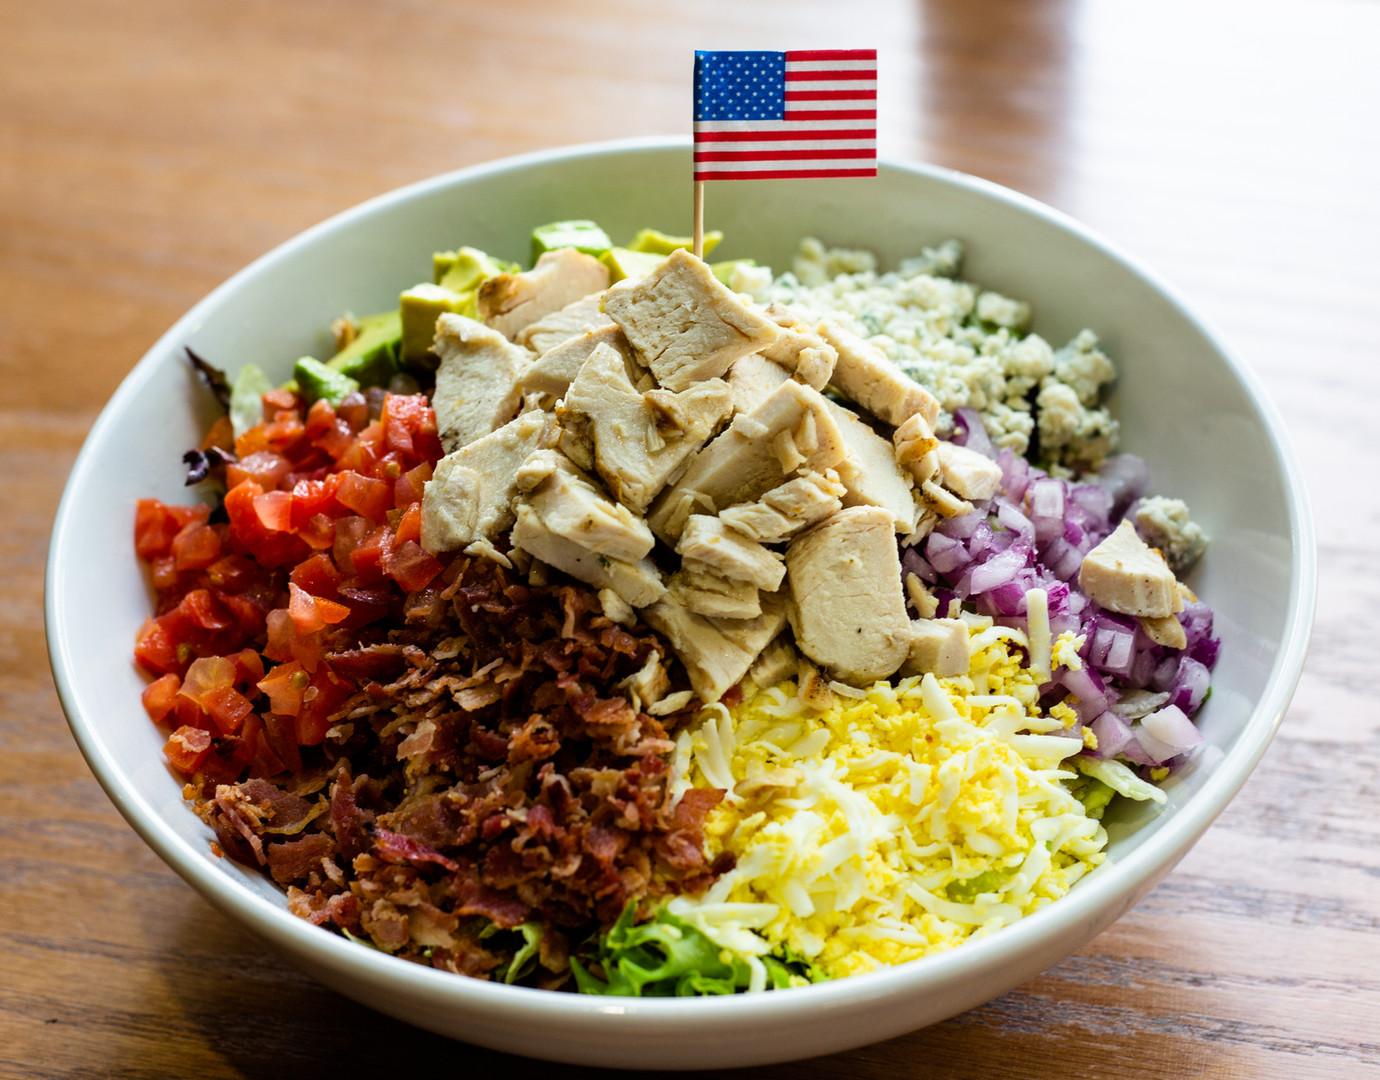 The Derby Cobb Salad